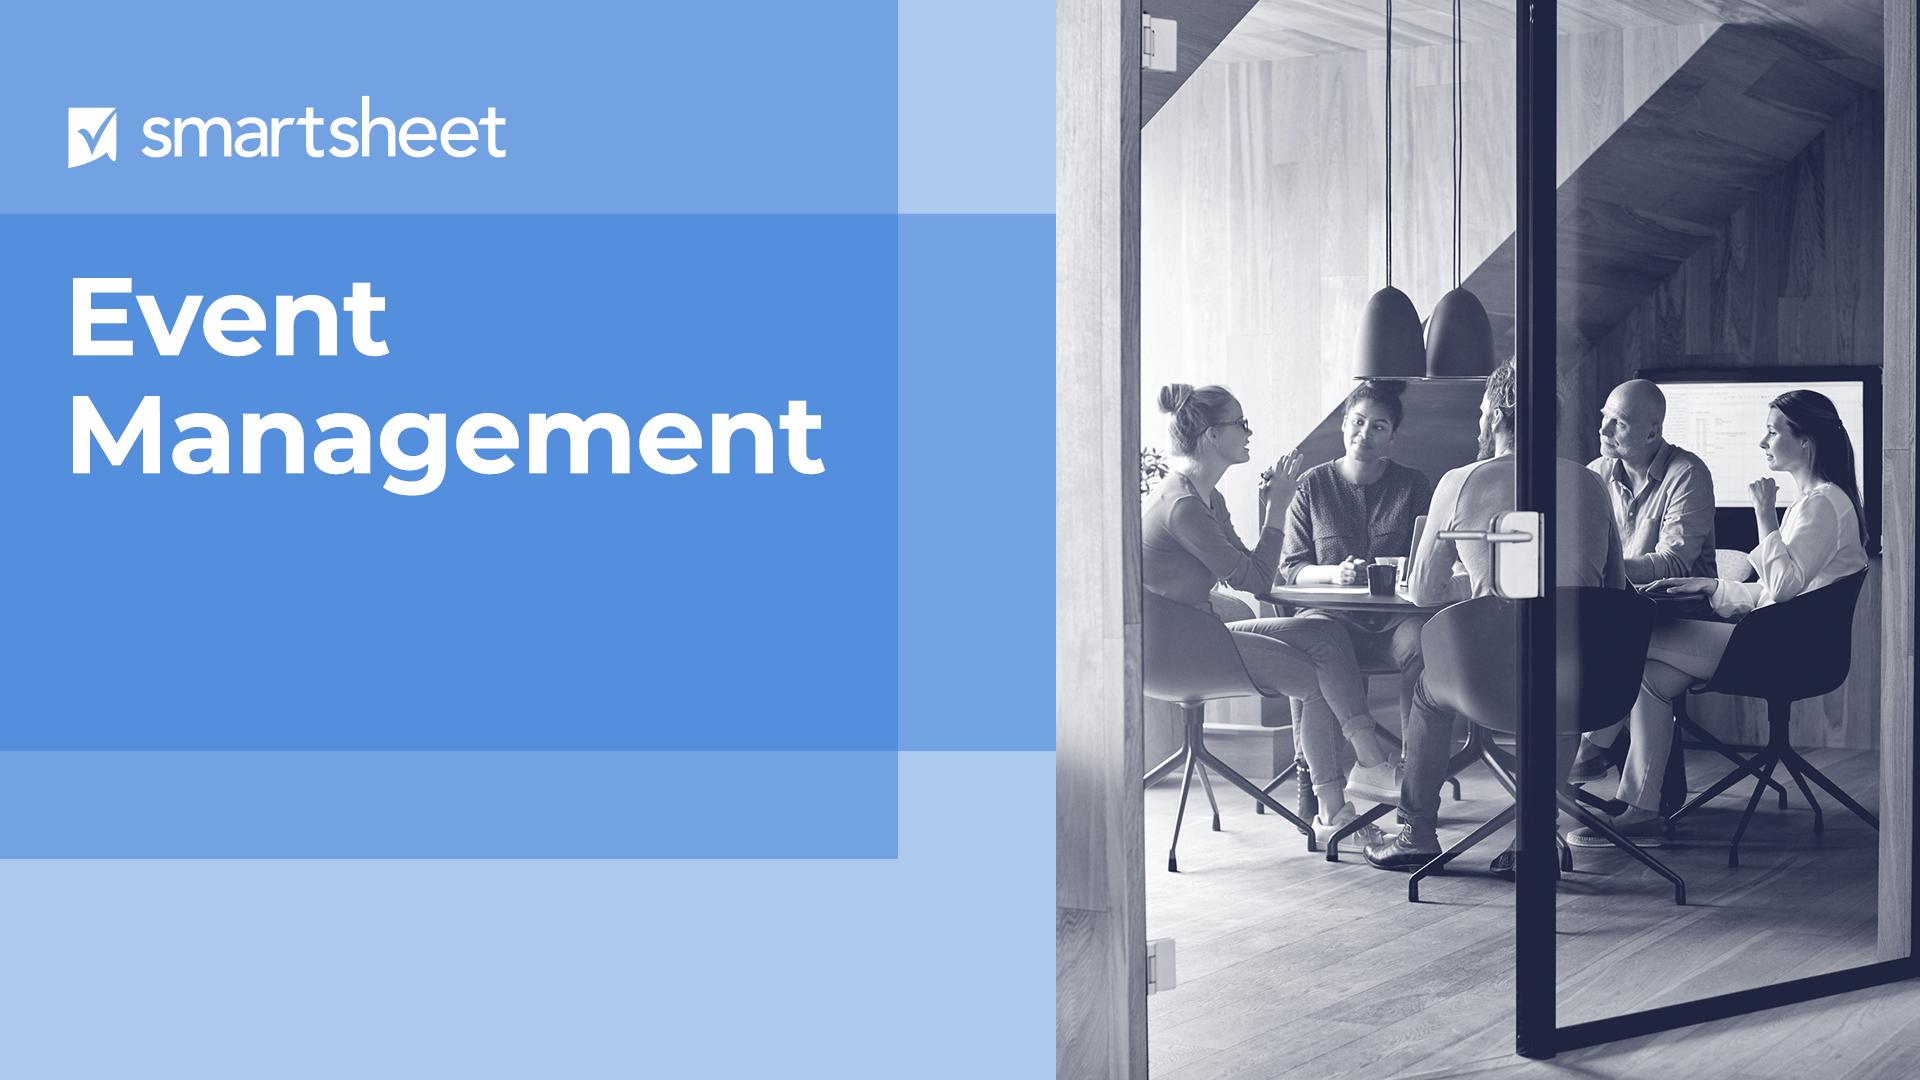 Event Management for Marketing